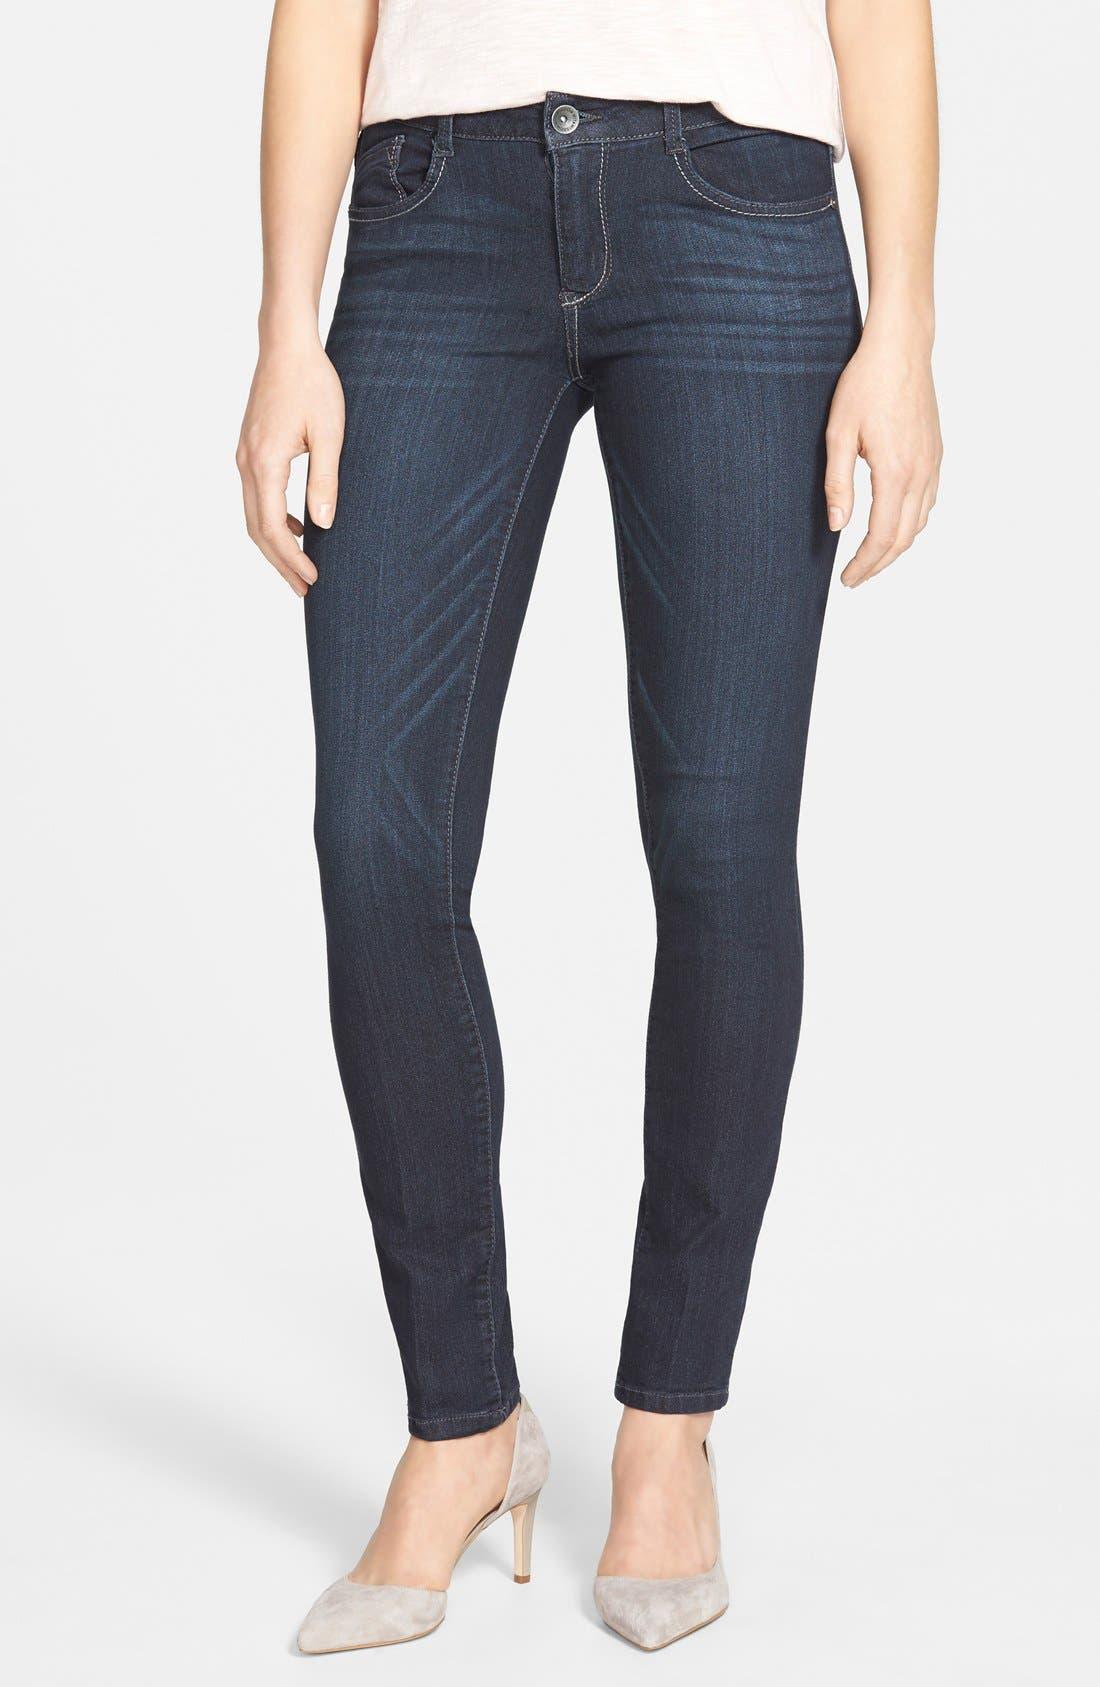 Main Image - Wit & Wisdom Super Smooth Stretch Denim Skinny Jeans (Dark Navy) (Regular & Petite) (Nordstrom Exclusive)